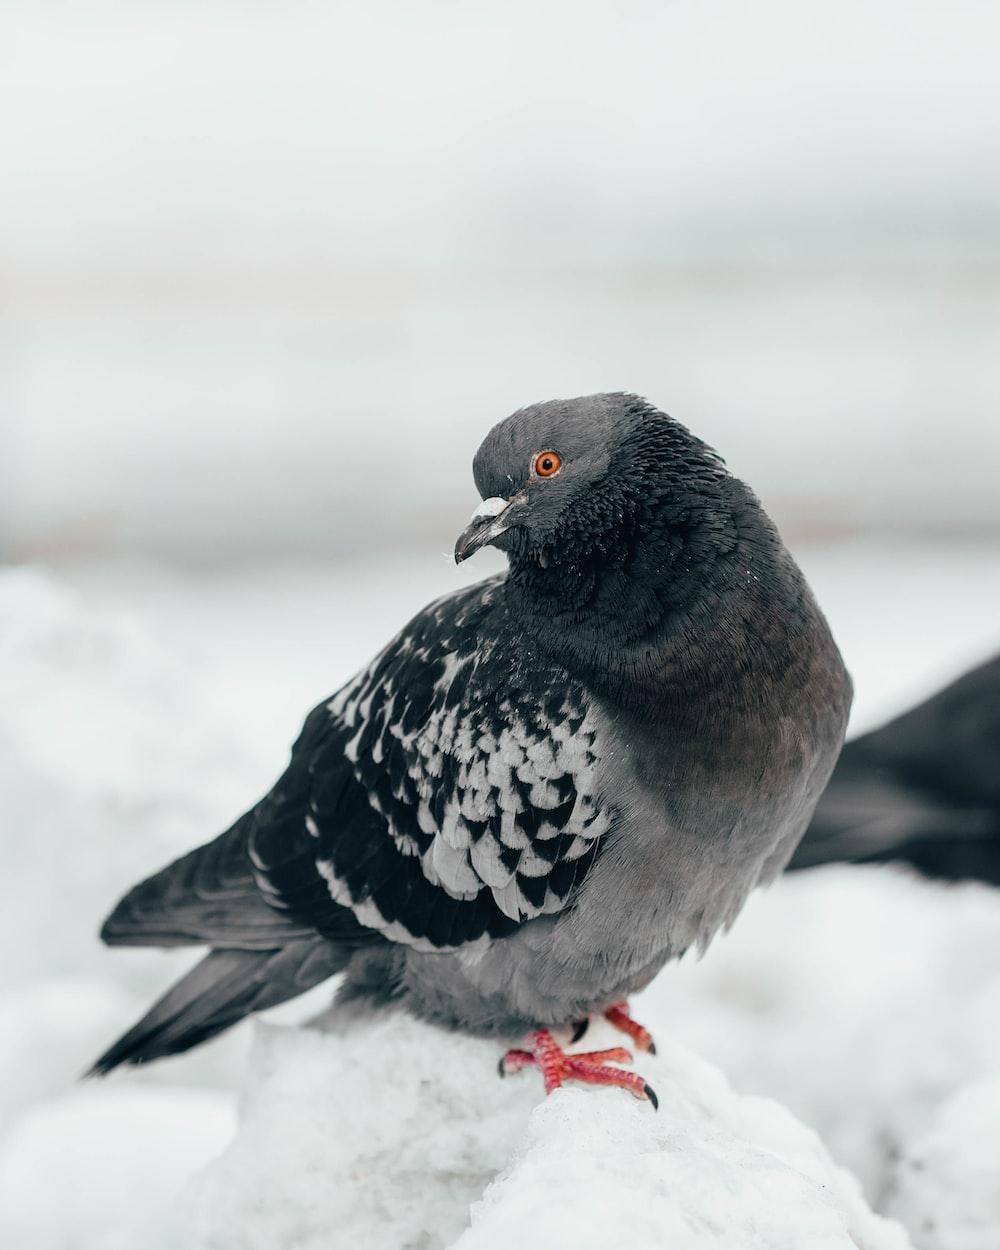 gray and black bird on snow